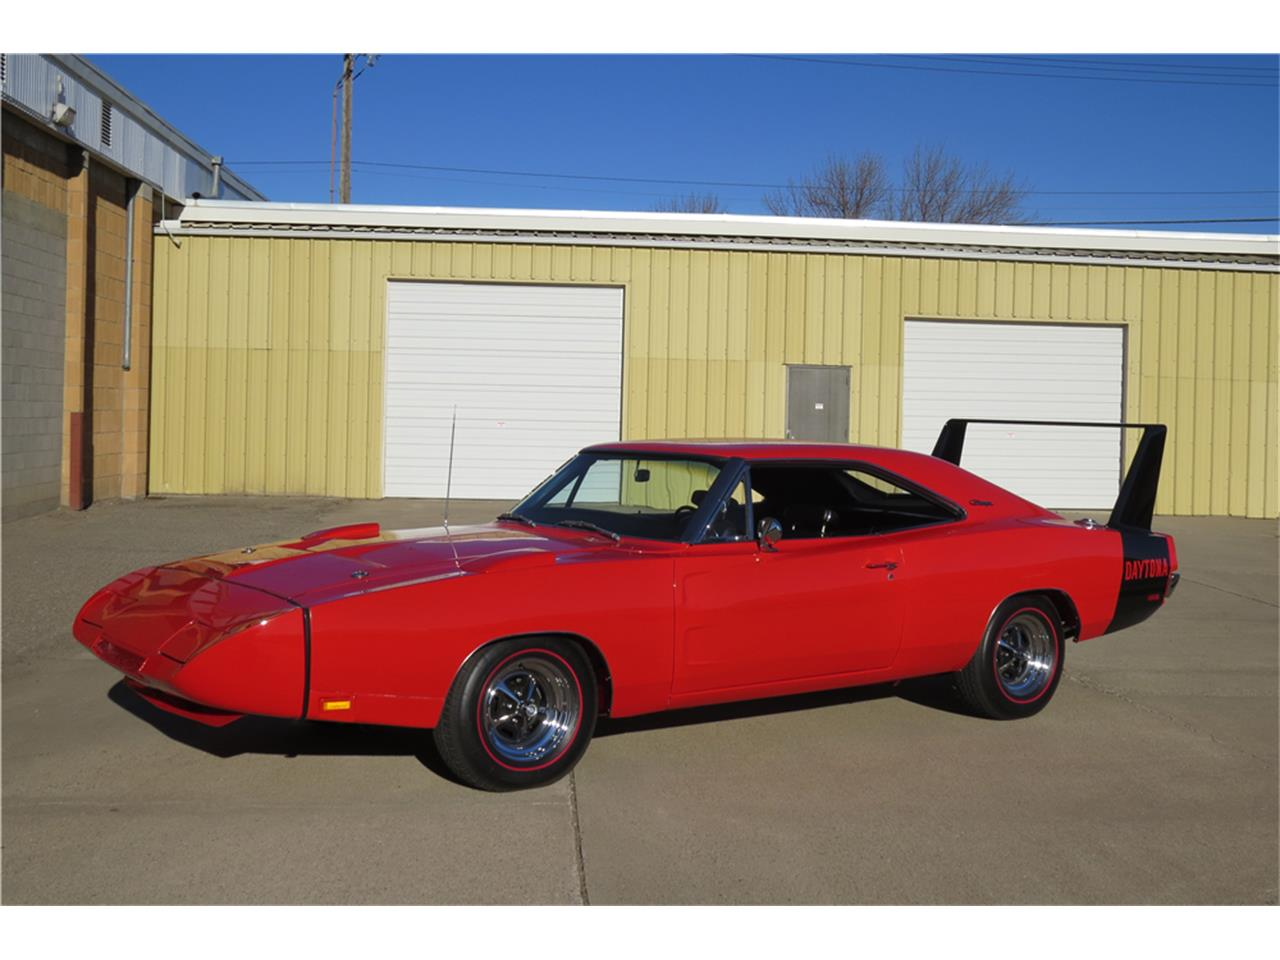 Charger Daytona For Sale >> 1969 Dodge Daytona For Sale Classiccars Com Cc 1049977